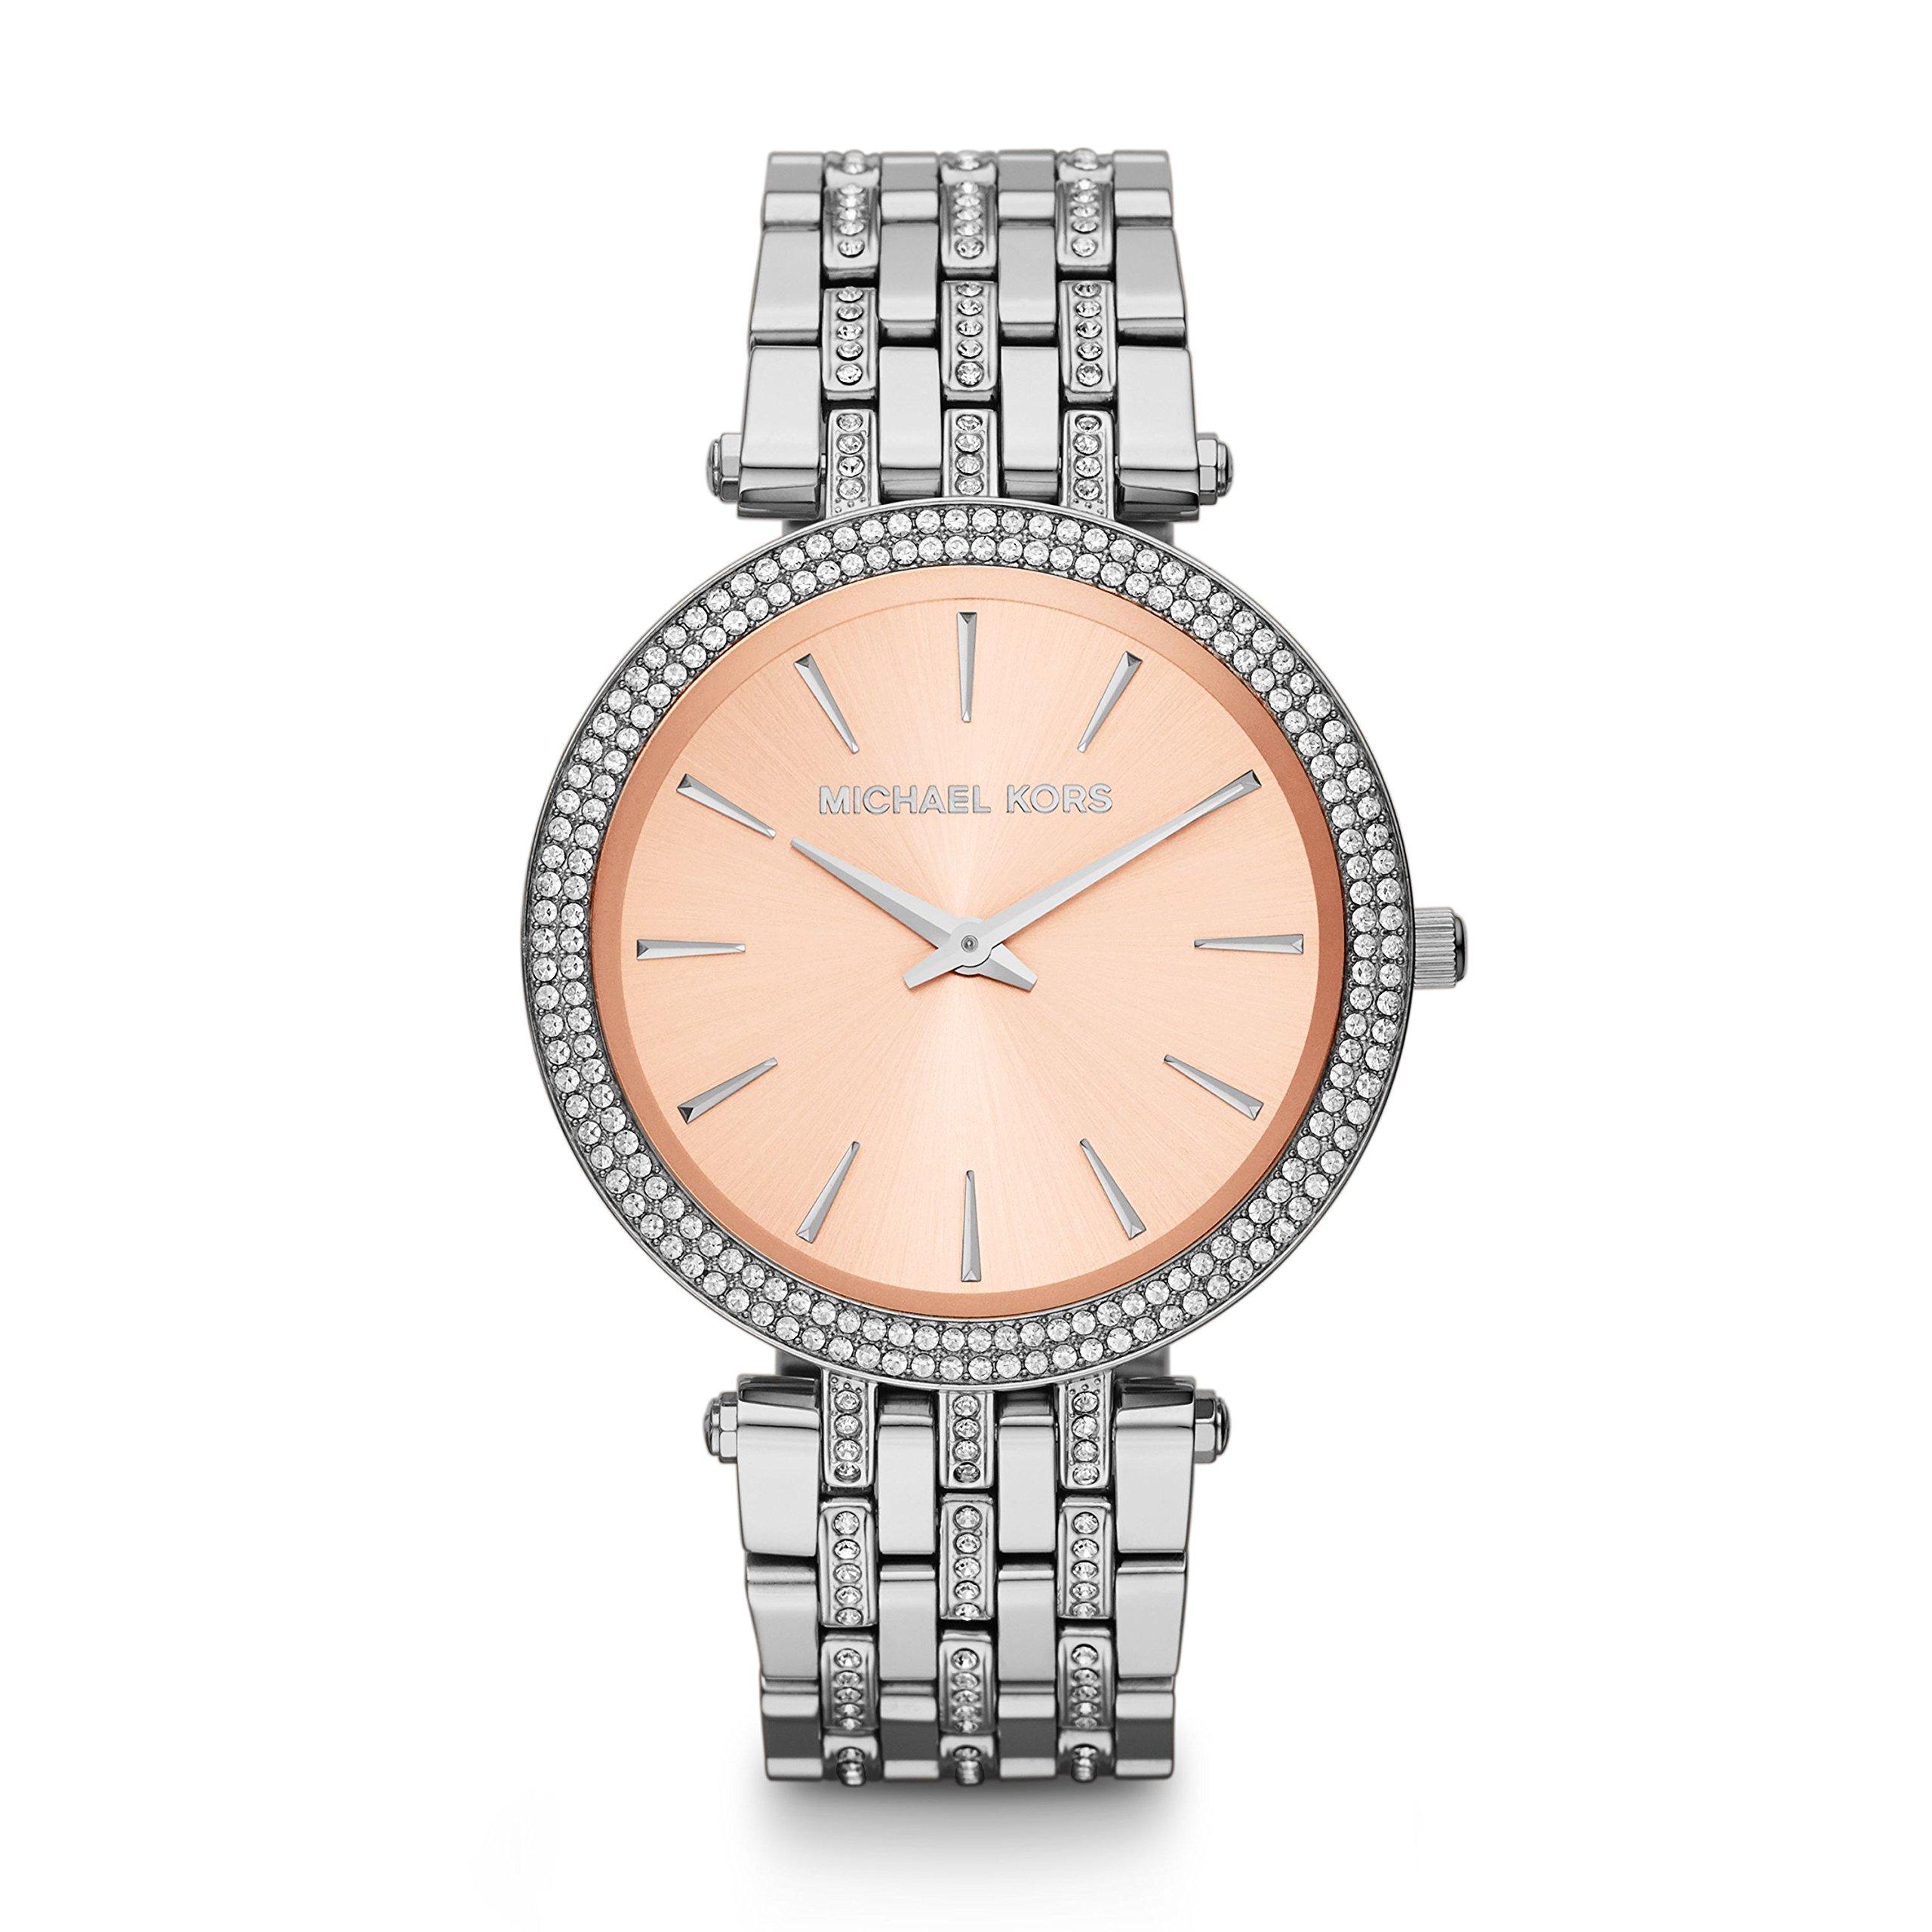 Michael Kors Silver-Tone Glitz Rose Dial Darci Watch